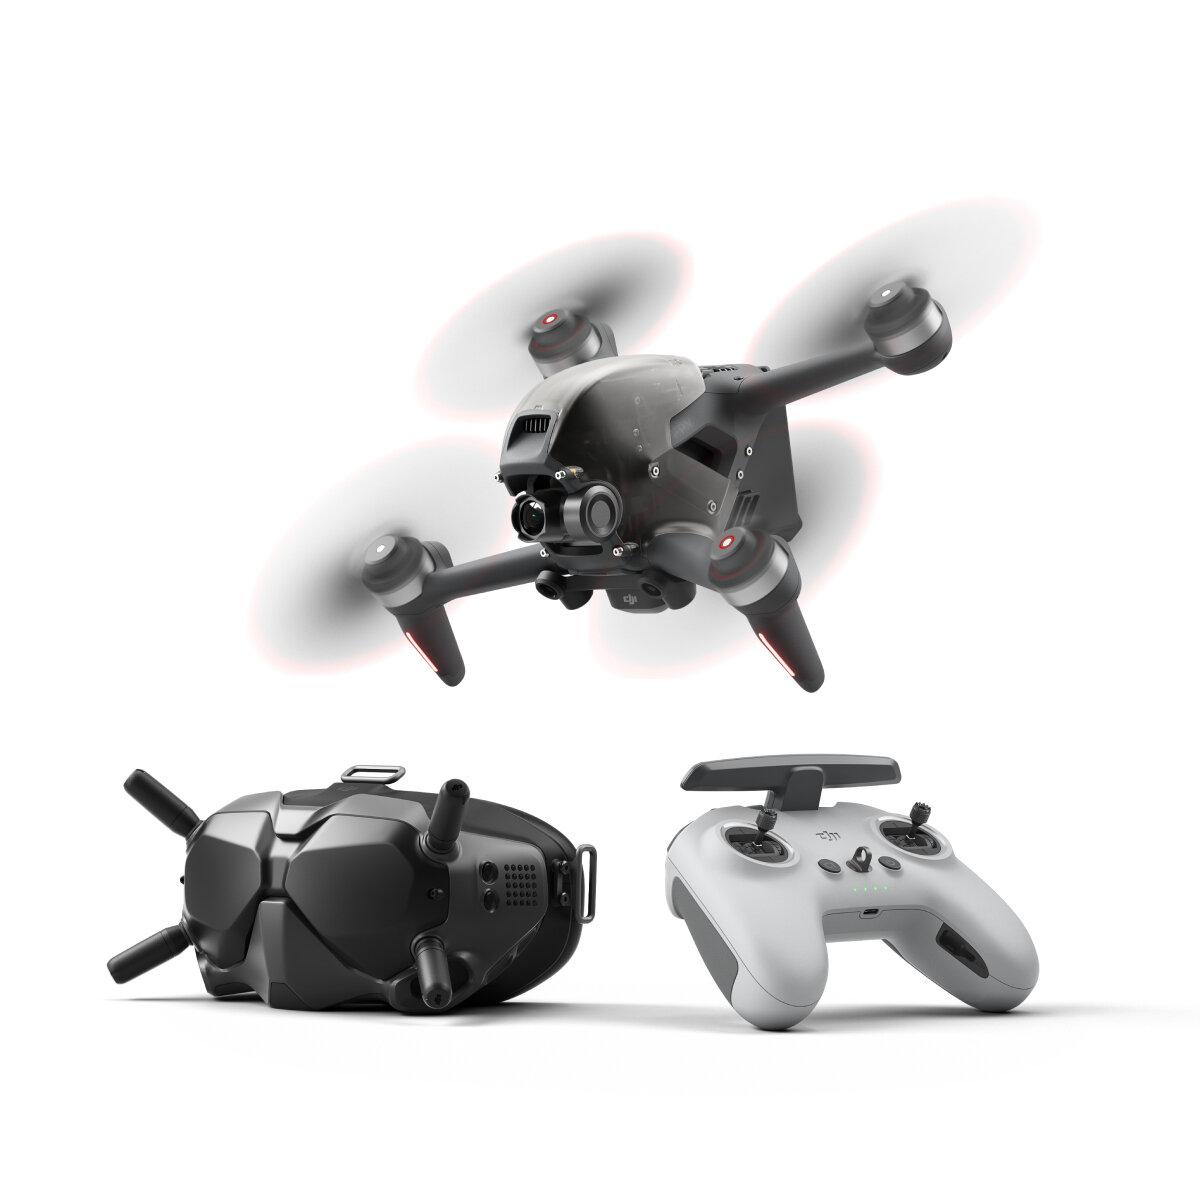 DJI FPV Combo 10KM 1080P FPV 4K 60fps 150° FOV Camera 20mins Flight Time 140 km/h Speed FPV Drone RC Quadcopter FPV Goggles V2 5.8GHz Transmitter Mode2